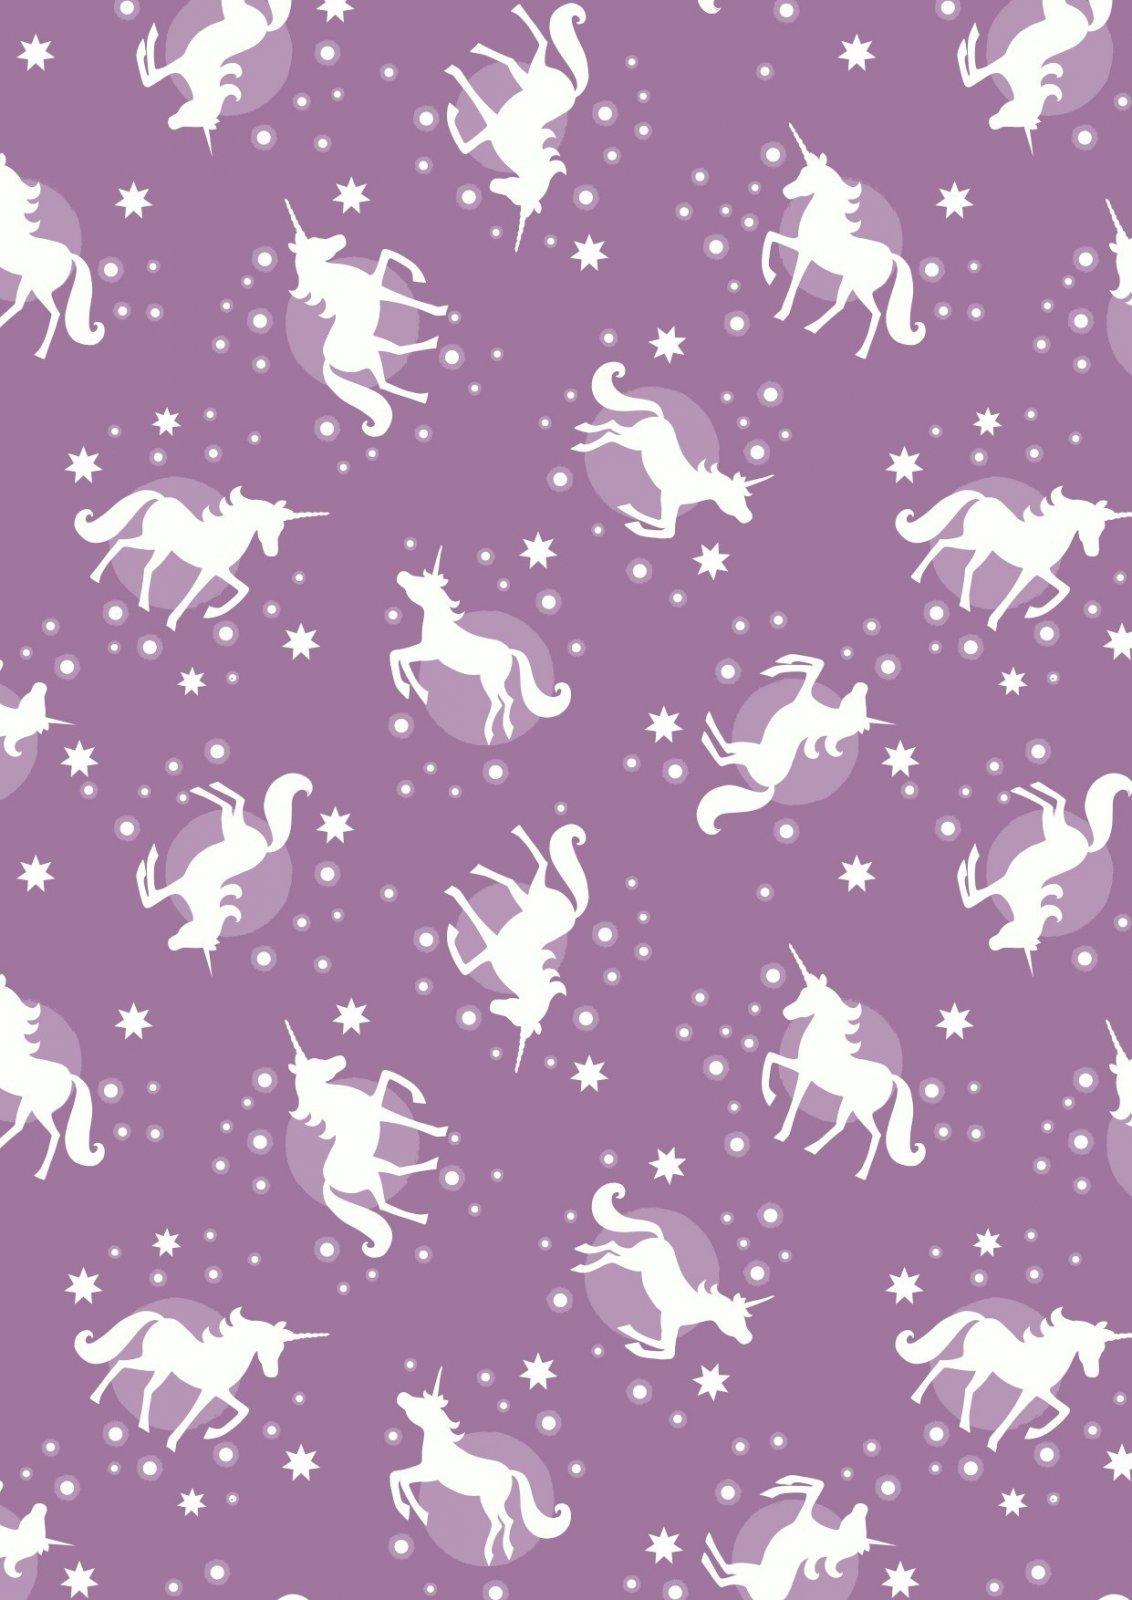 Unicorn Spots on Soft Blackberry